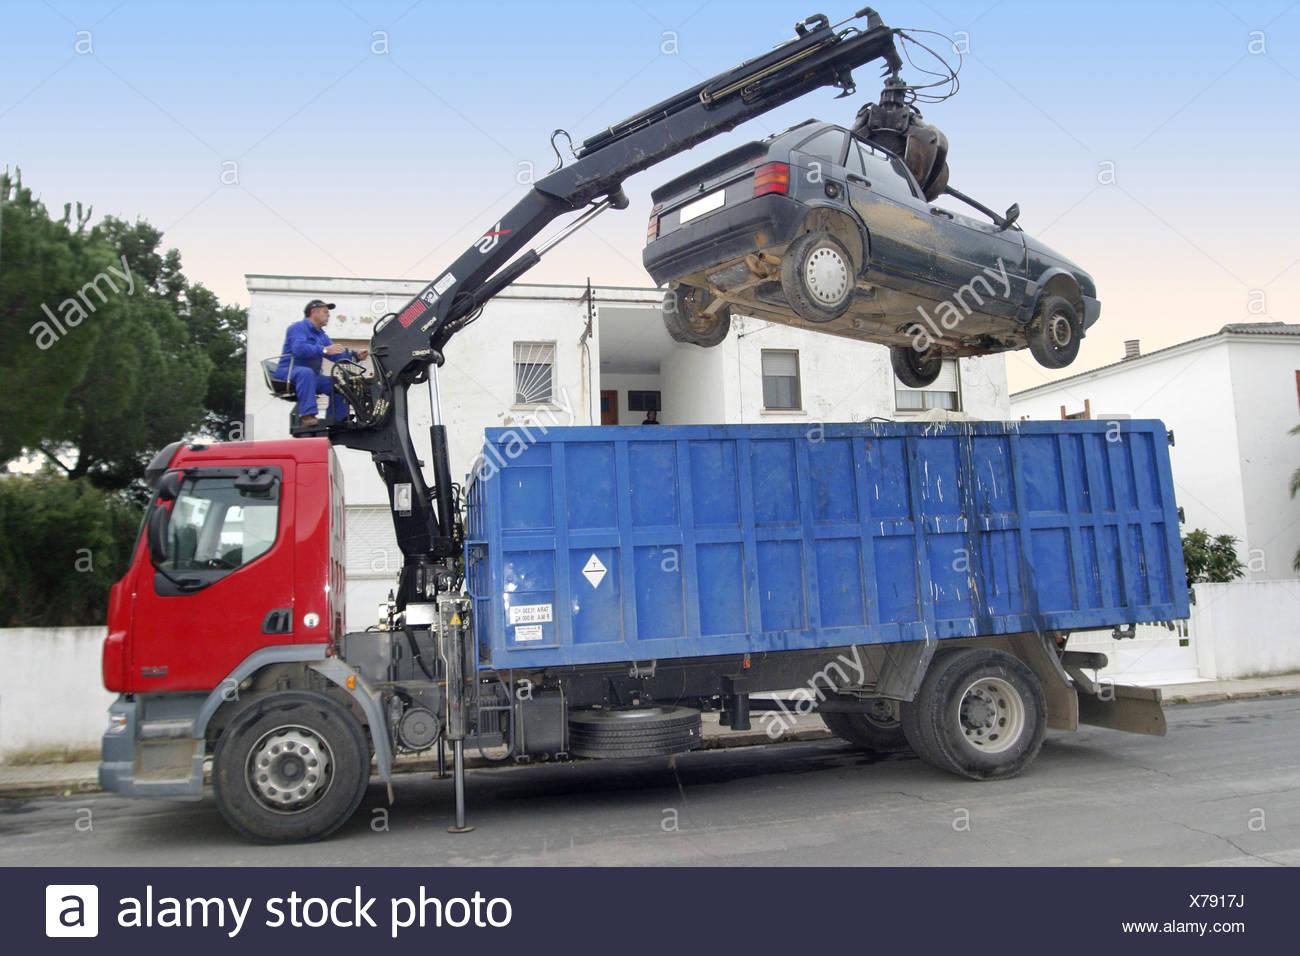 Truck with crane taking car to scrapyard - Stock Image